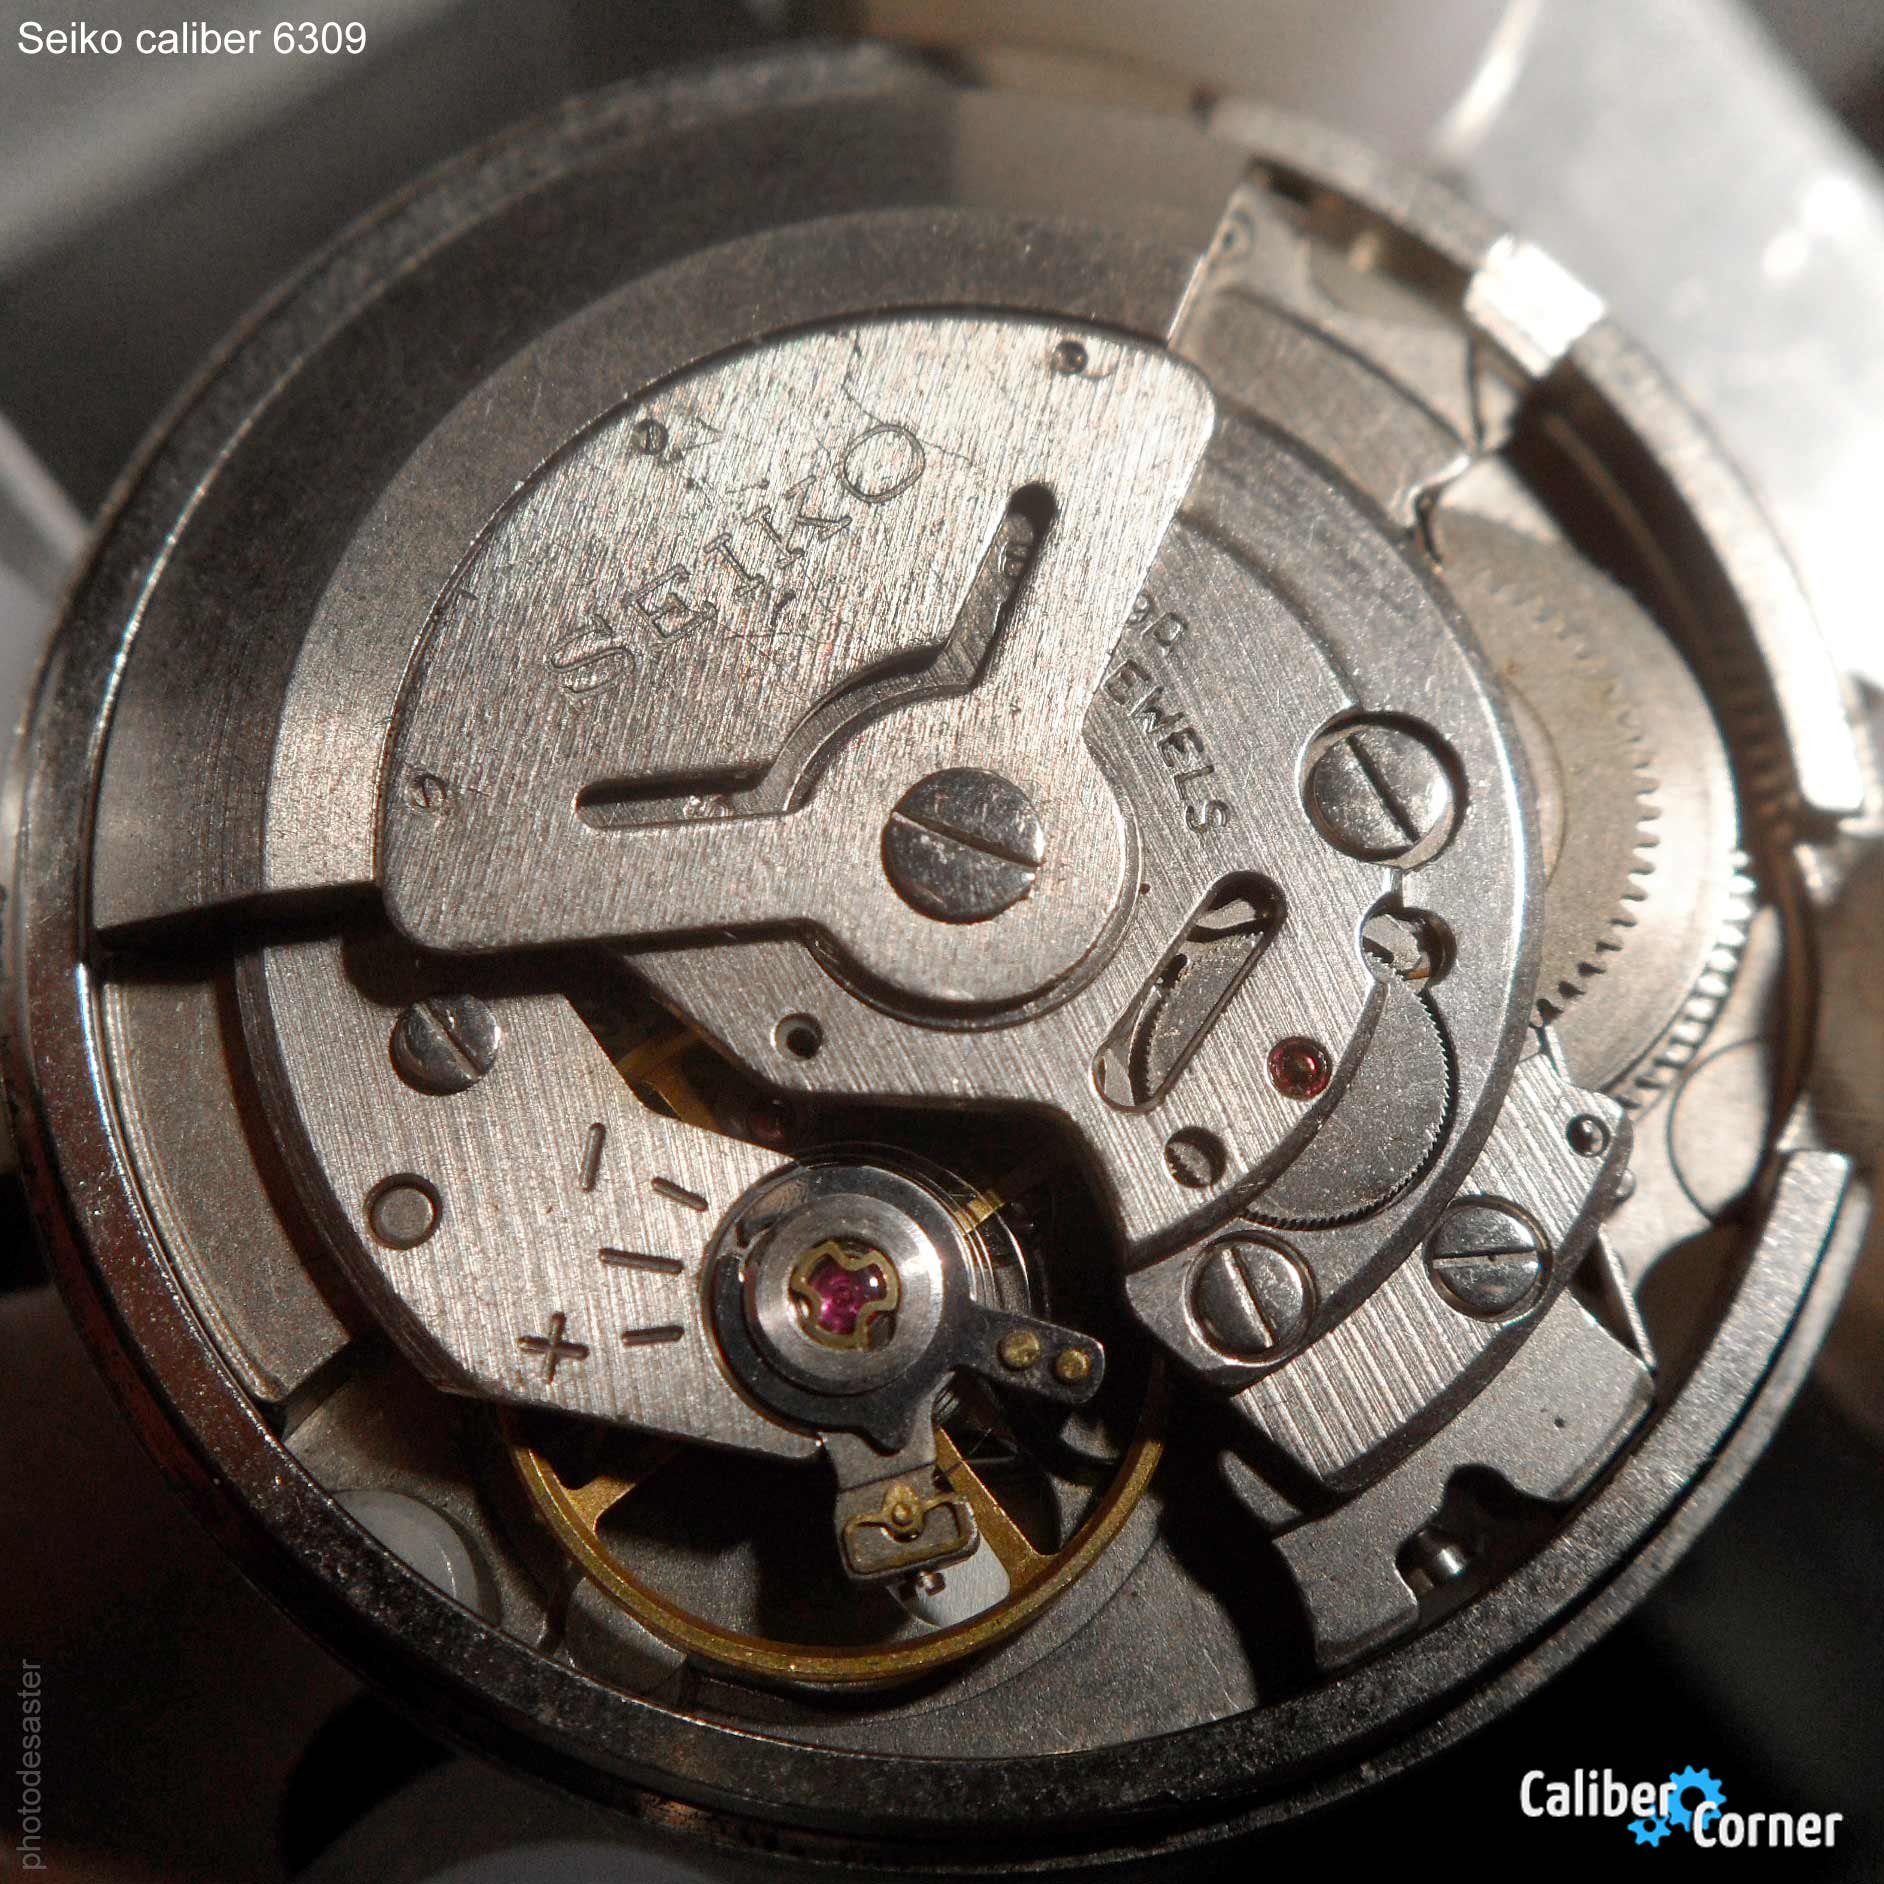 Seiko caliber 6309